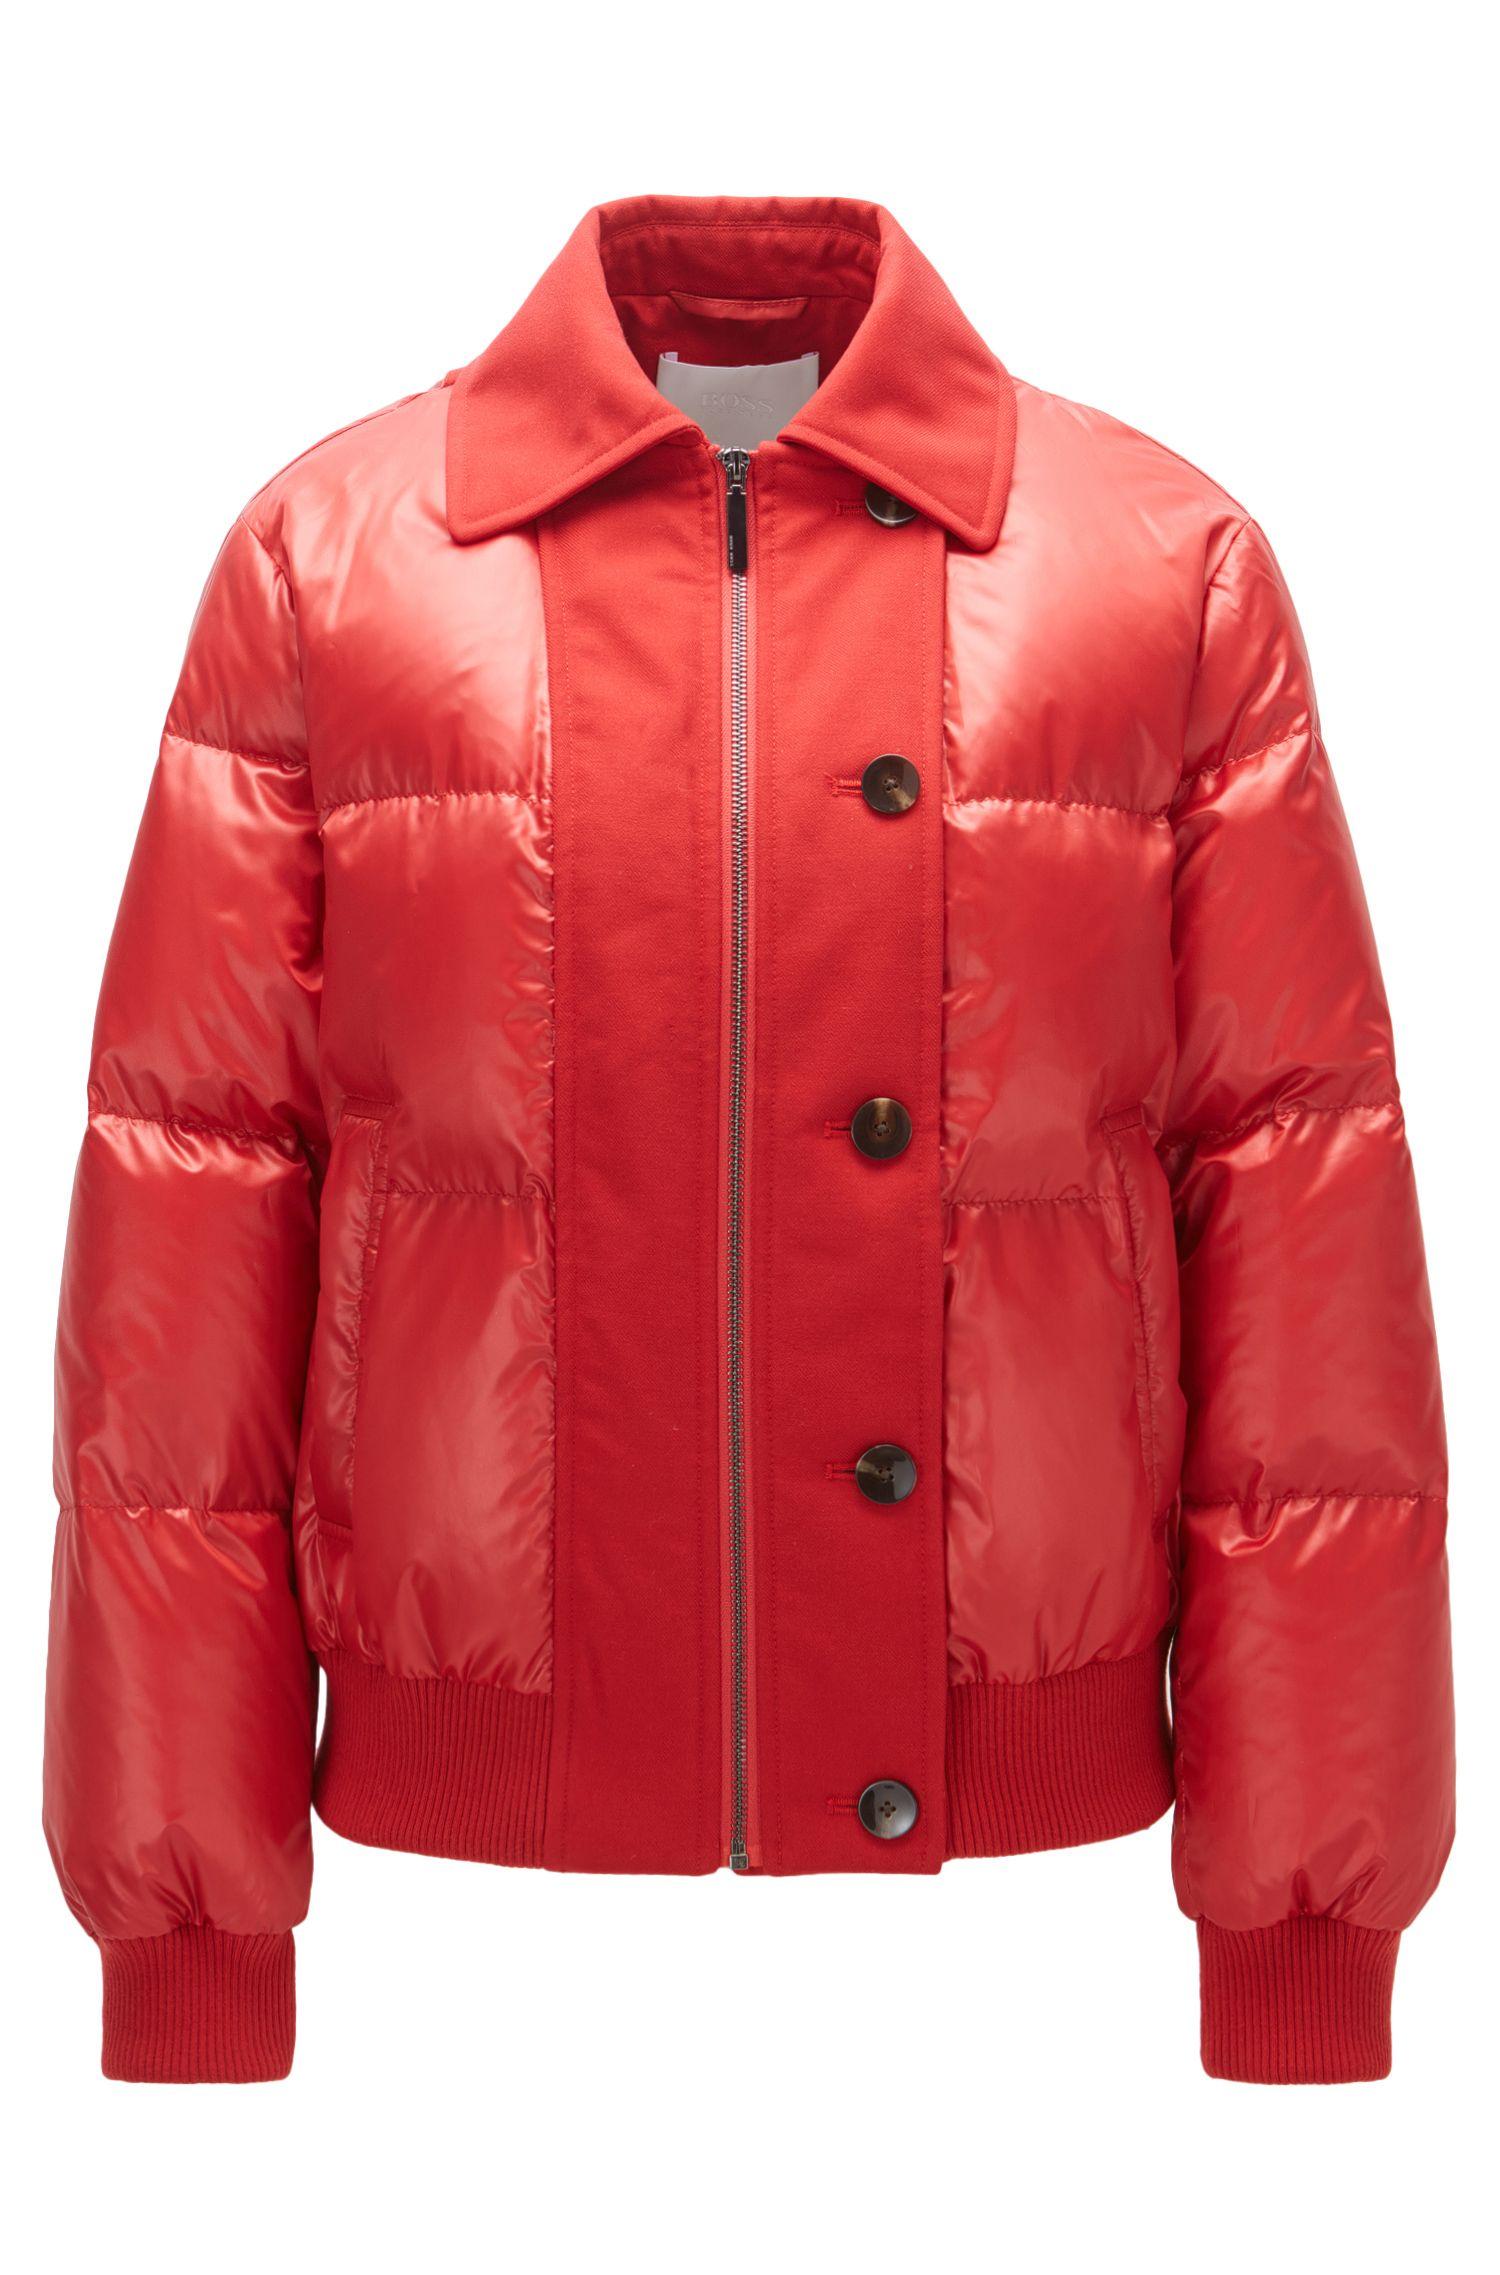 Regular-fit down jacket in water-repellent fabric